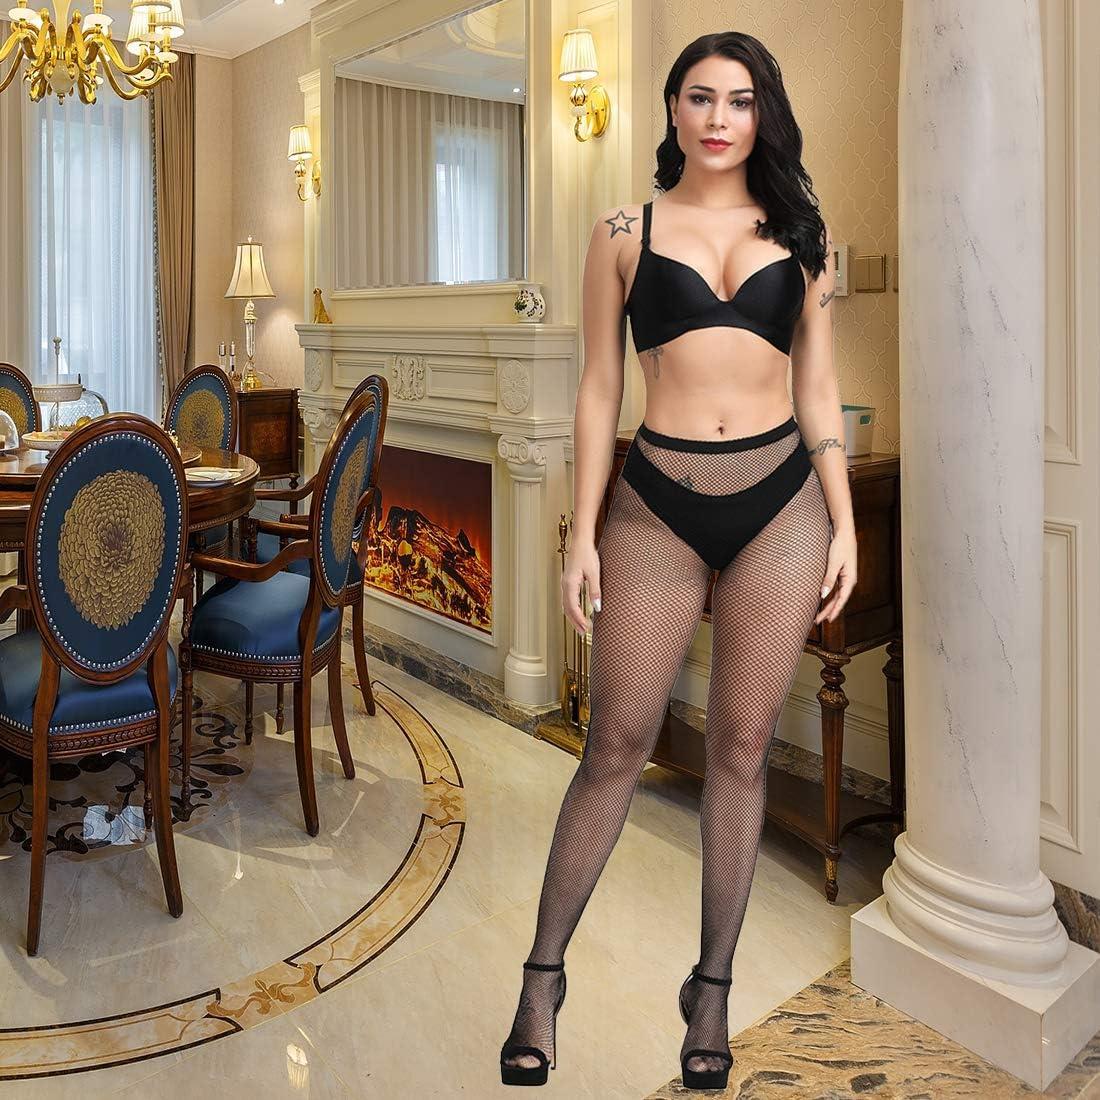 Fafulan High Waist Tights Fishnet Stockings Thigh High Stockings Pantyhose High Waist Tights Fishnet Stockings Thigh High Stockings Pantyhose, Black Big Net, S-XXXL: Clothing